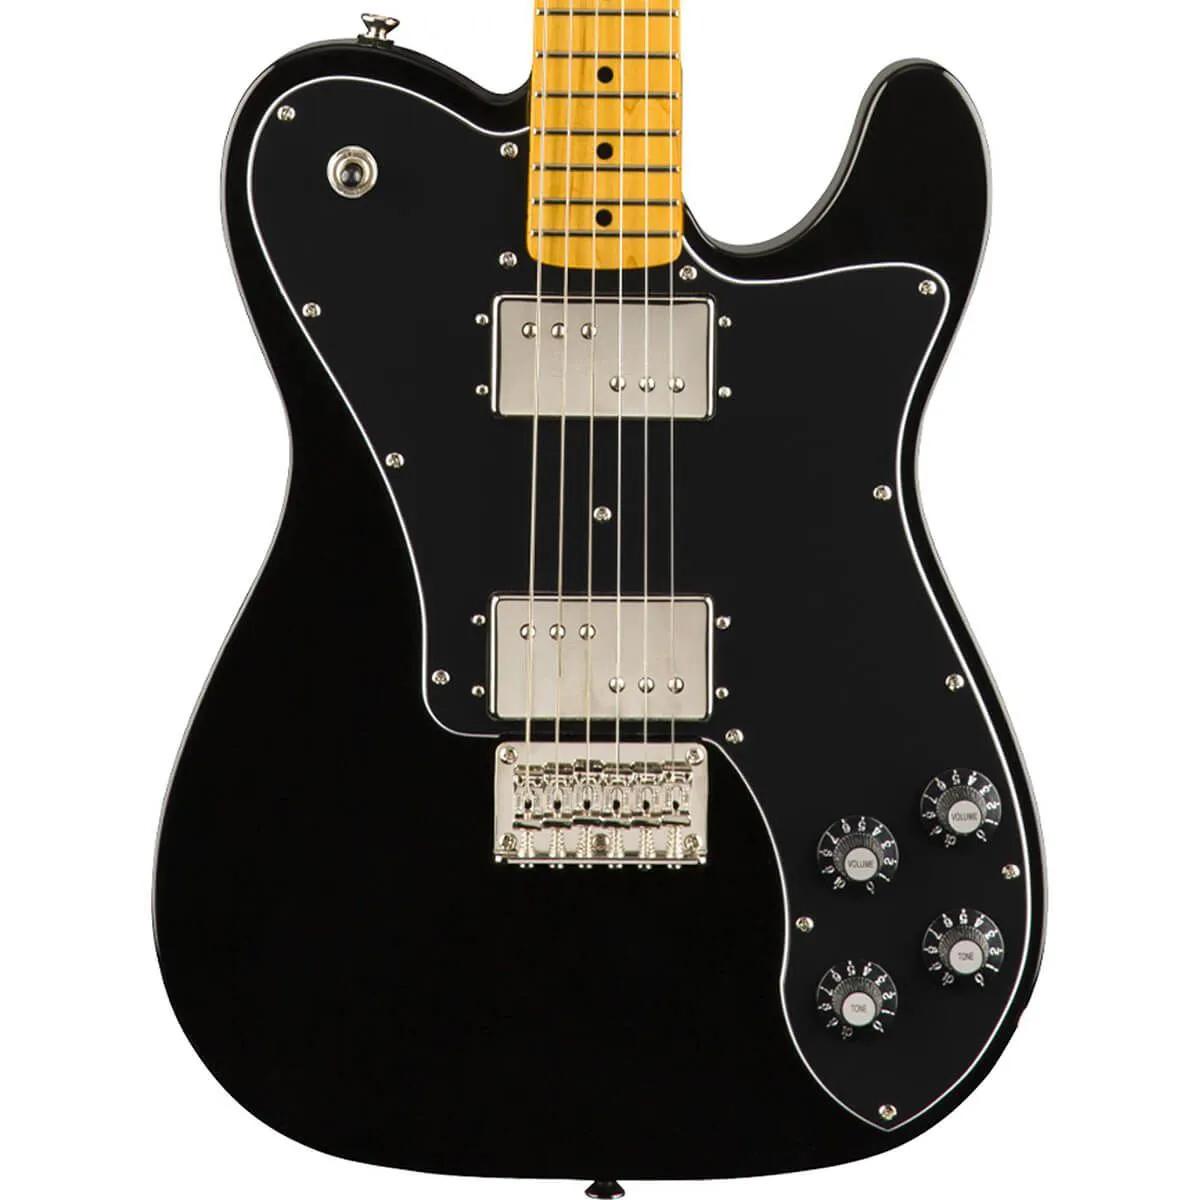 Guitarra Fender Squier Classic Vibe 70s Telecaster Deluxe Black